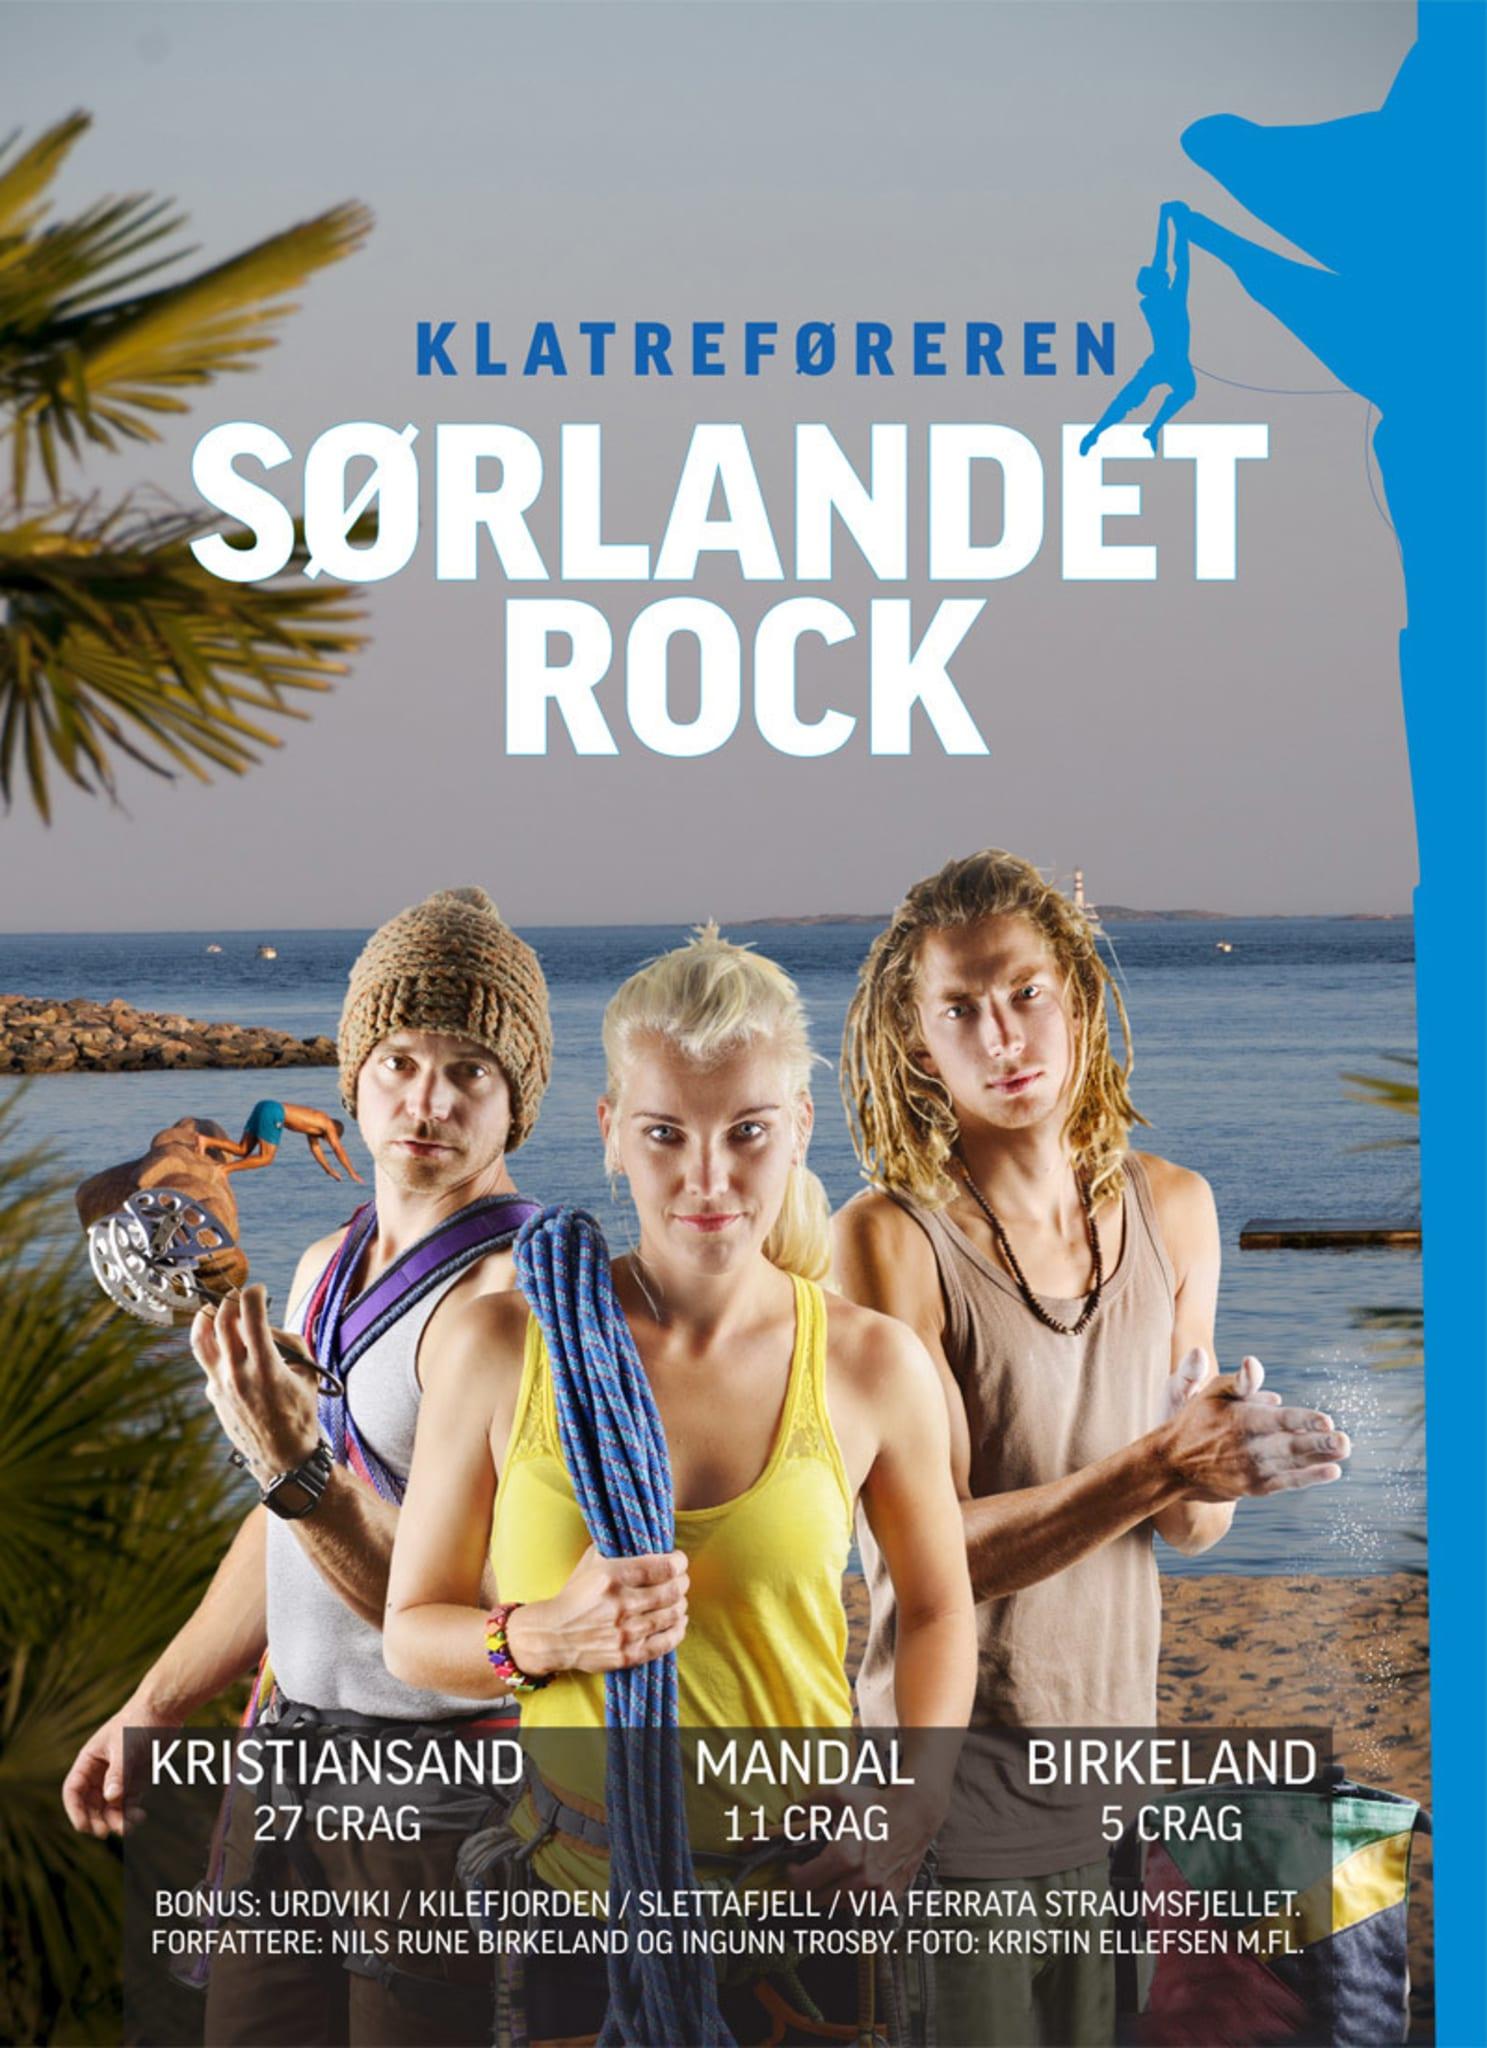 Klatrefører for Mandal, Kristiansand og Birkeland